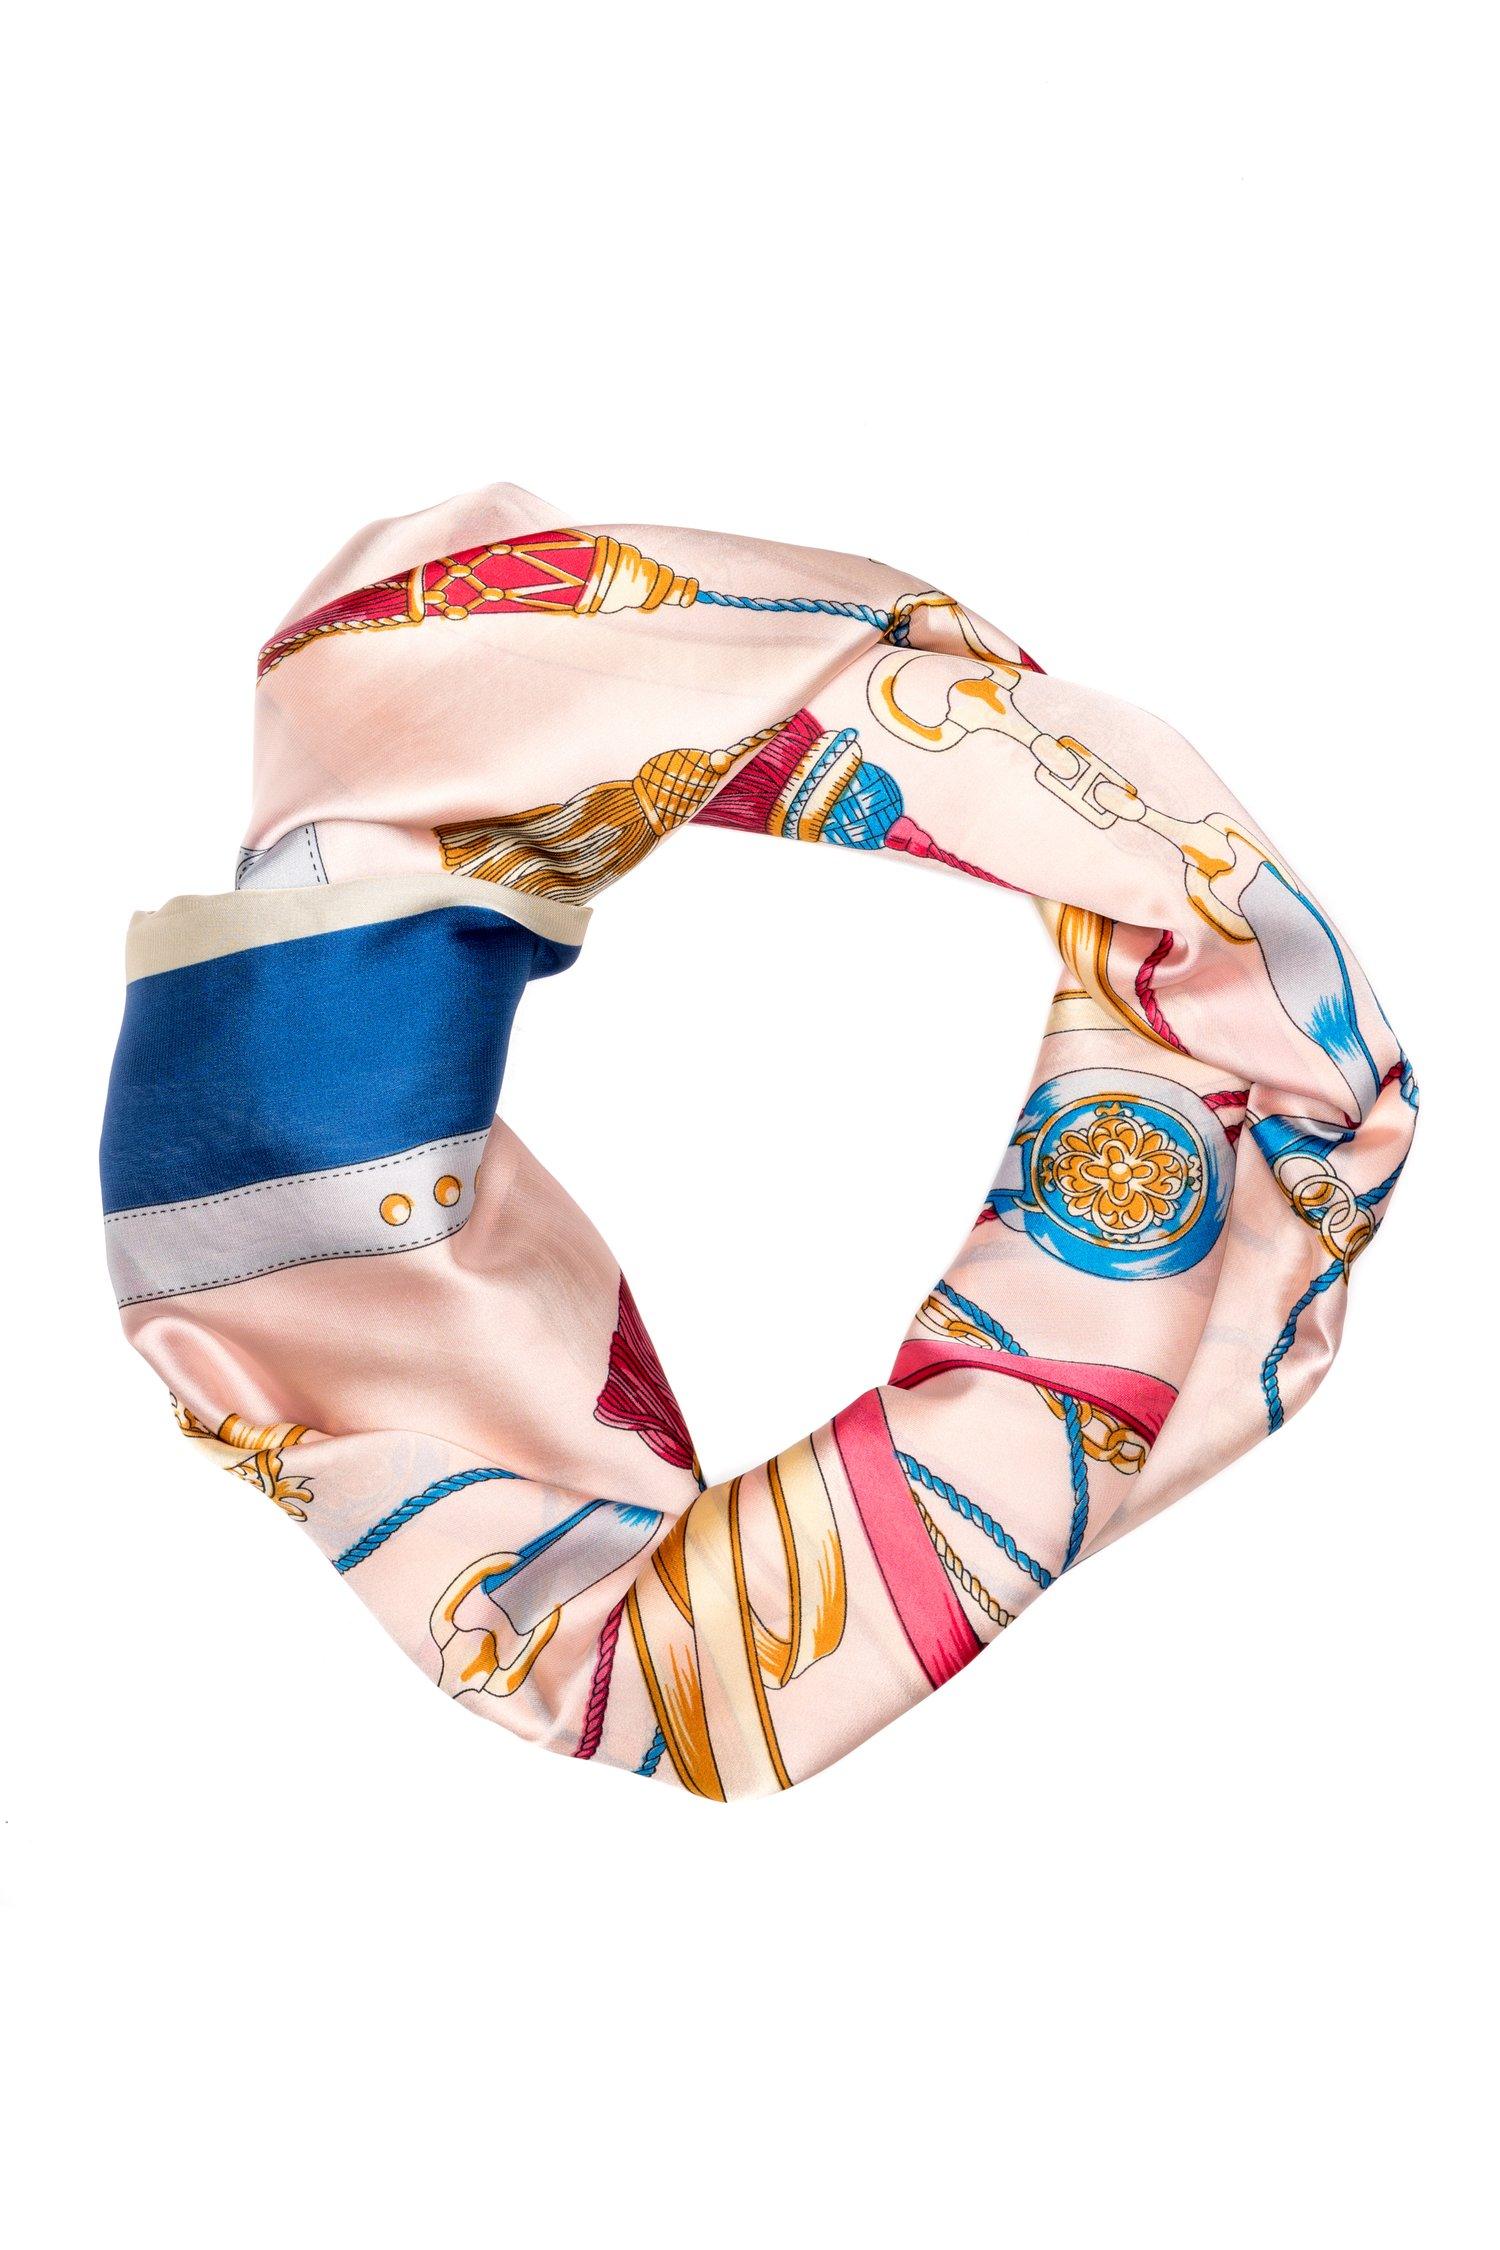 Esarfa roz cu albastru si detalii colorate thumbnail